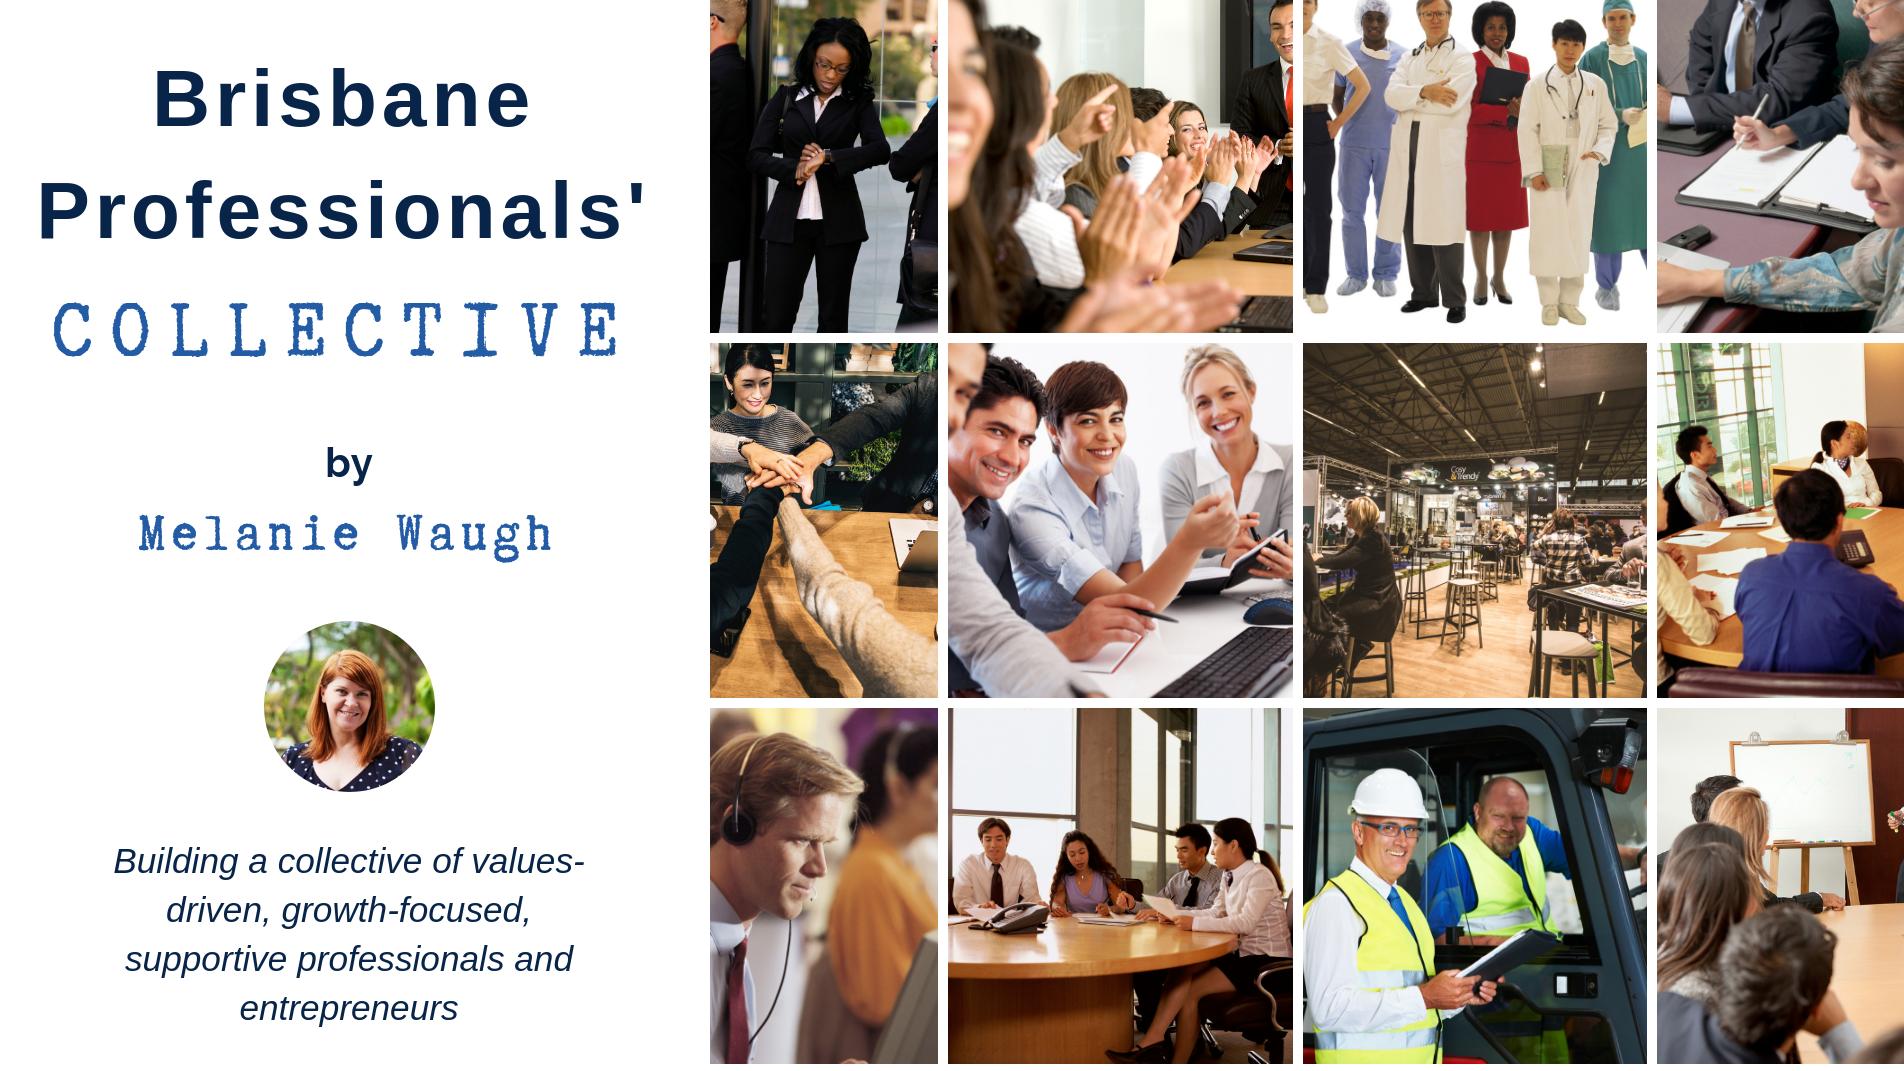 Brisbane Professionals' Collective